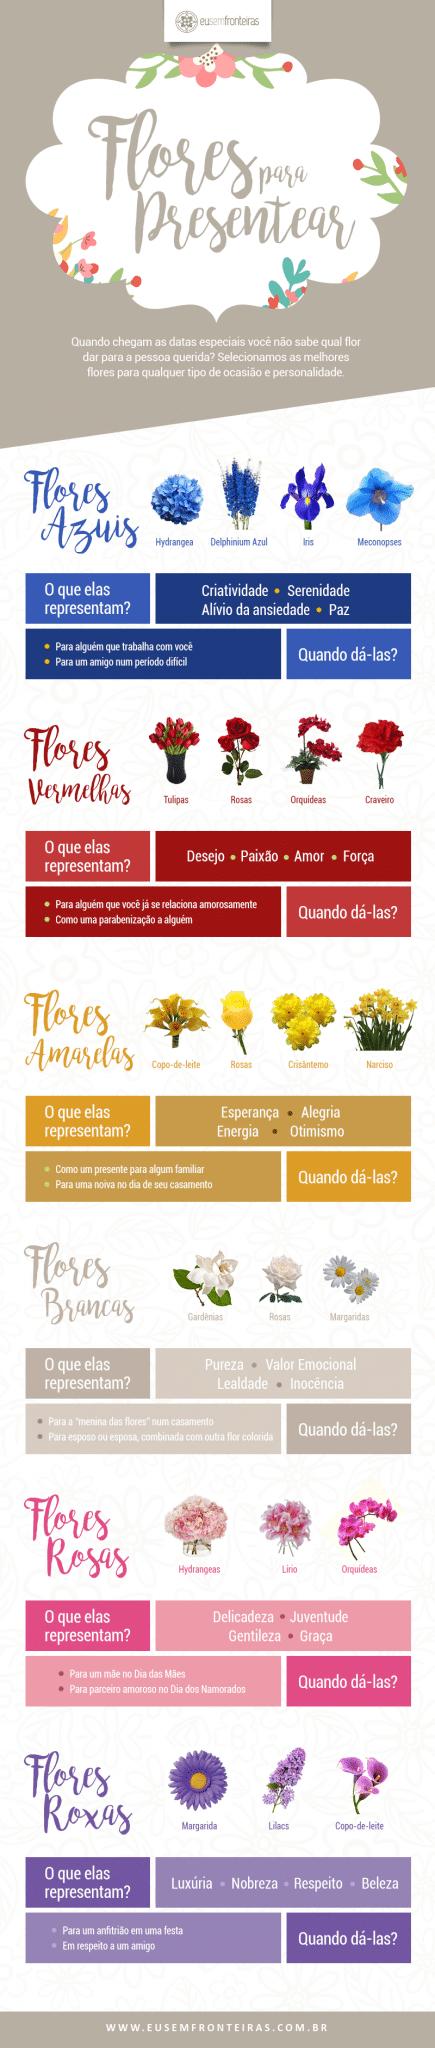 infografico-flores